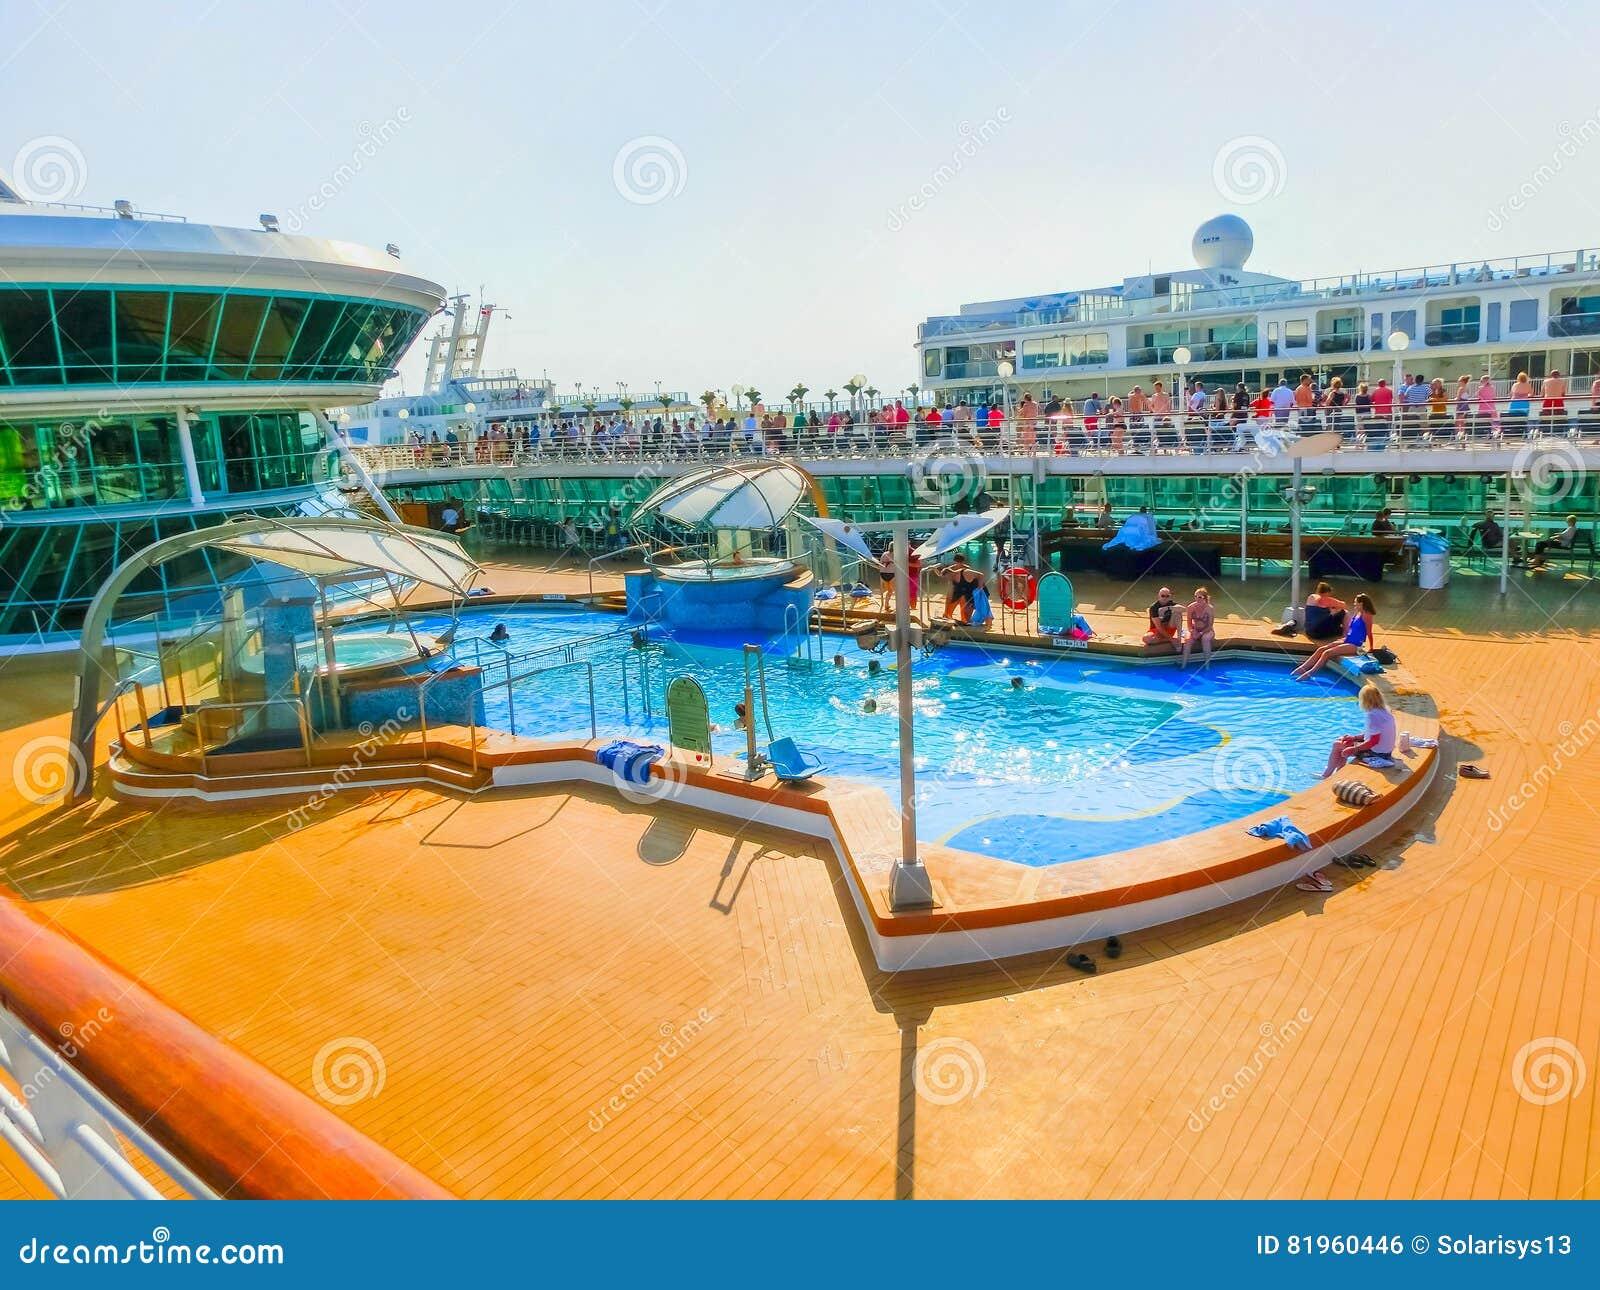 Venice, Italy - June 06, 2015: Cruise ship Splendour of the Seas by Royal Caribbean International